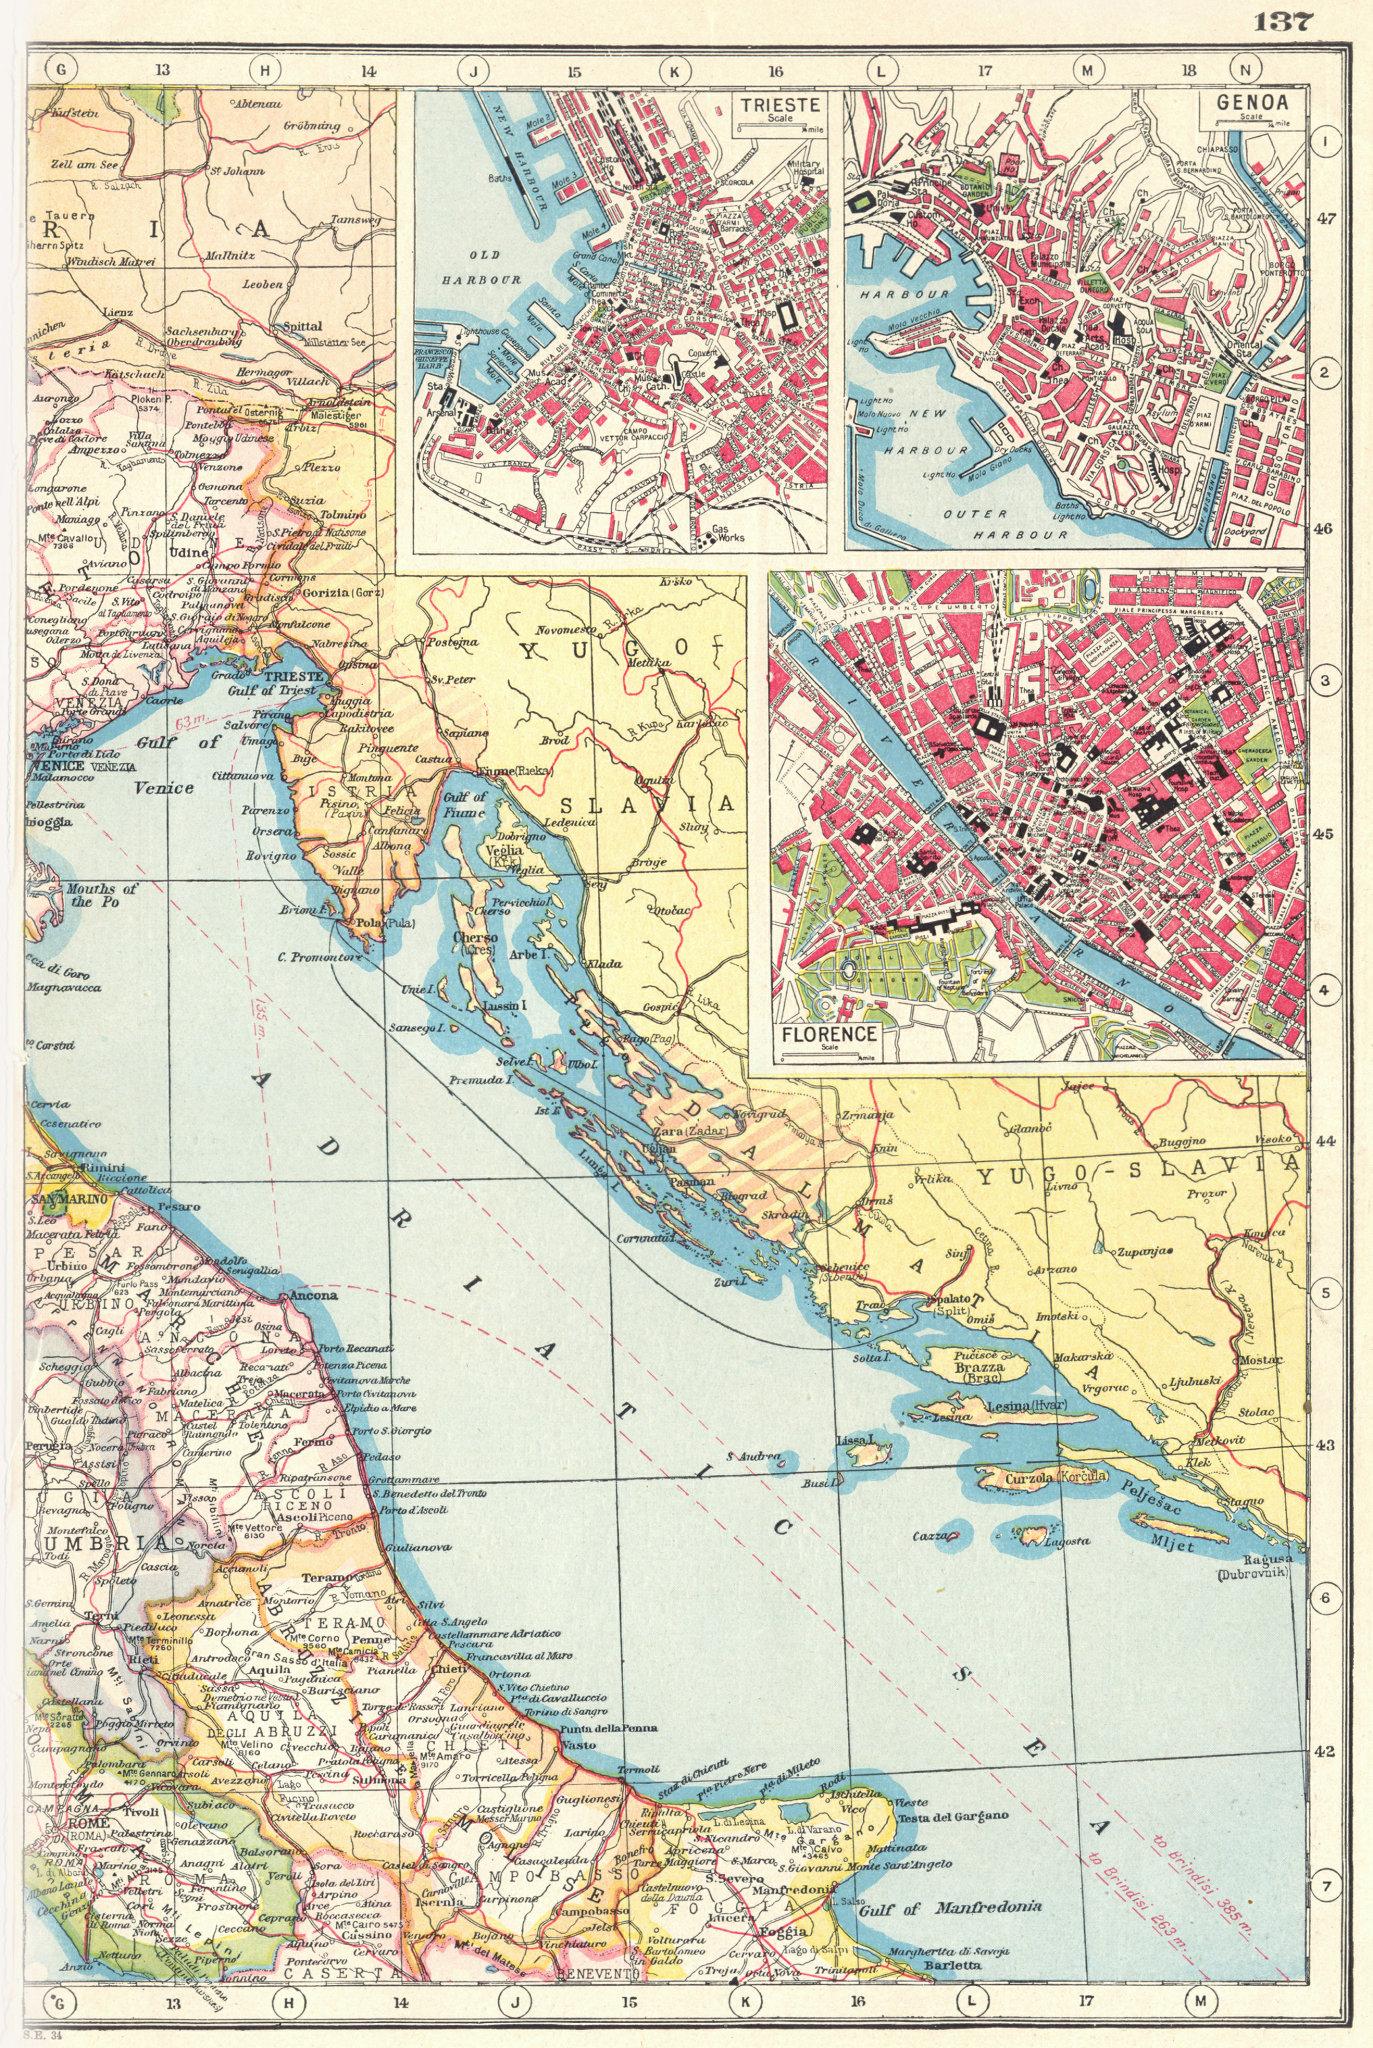 Associate Product ITALY ADRIATIC COAST. inset Trieste Genoa & Florence plans. Telegraphs 1920 map